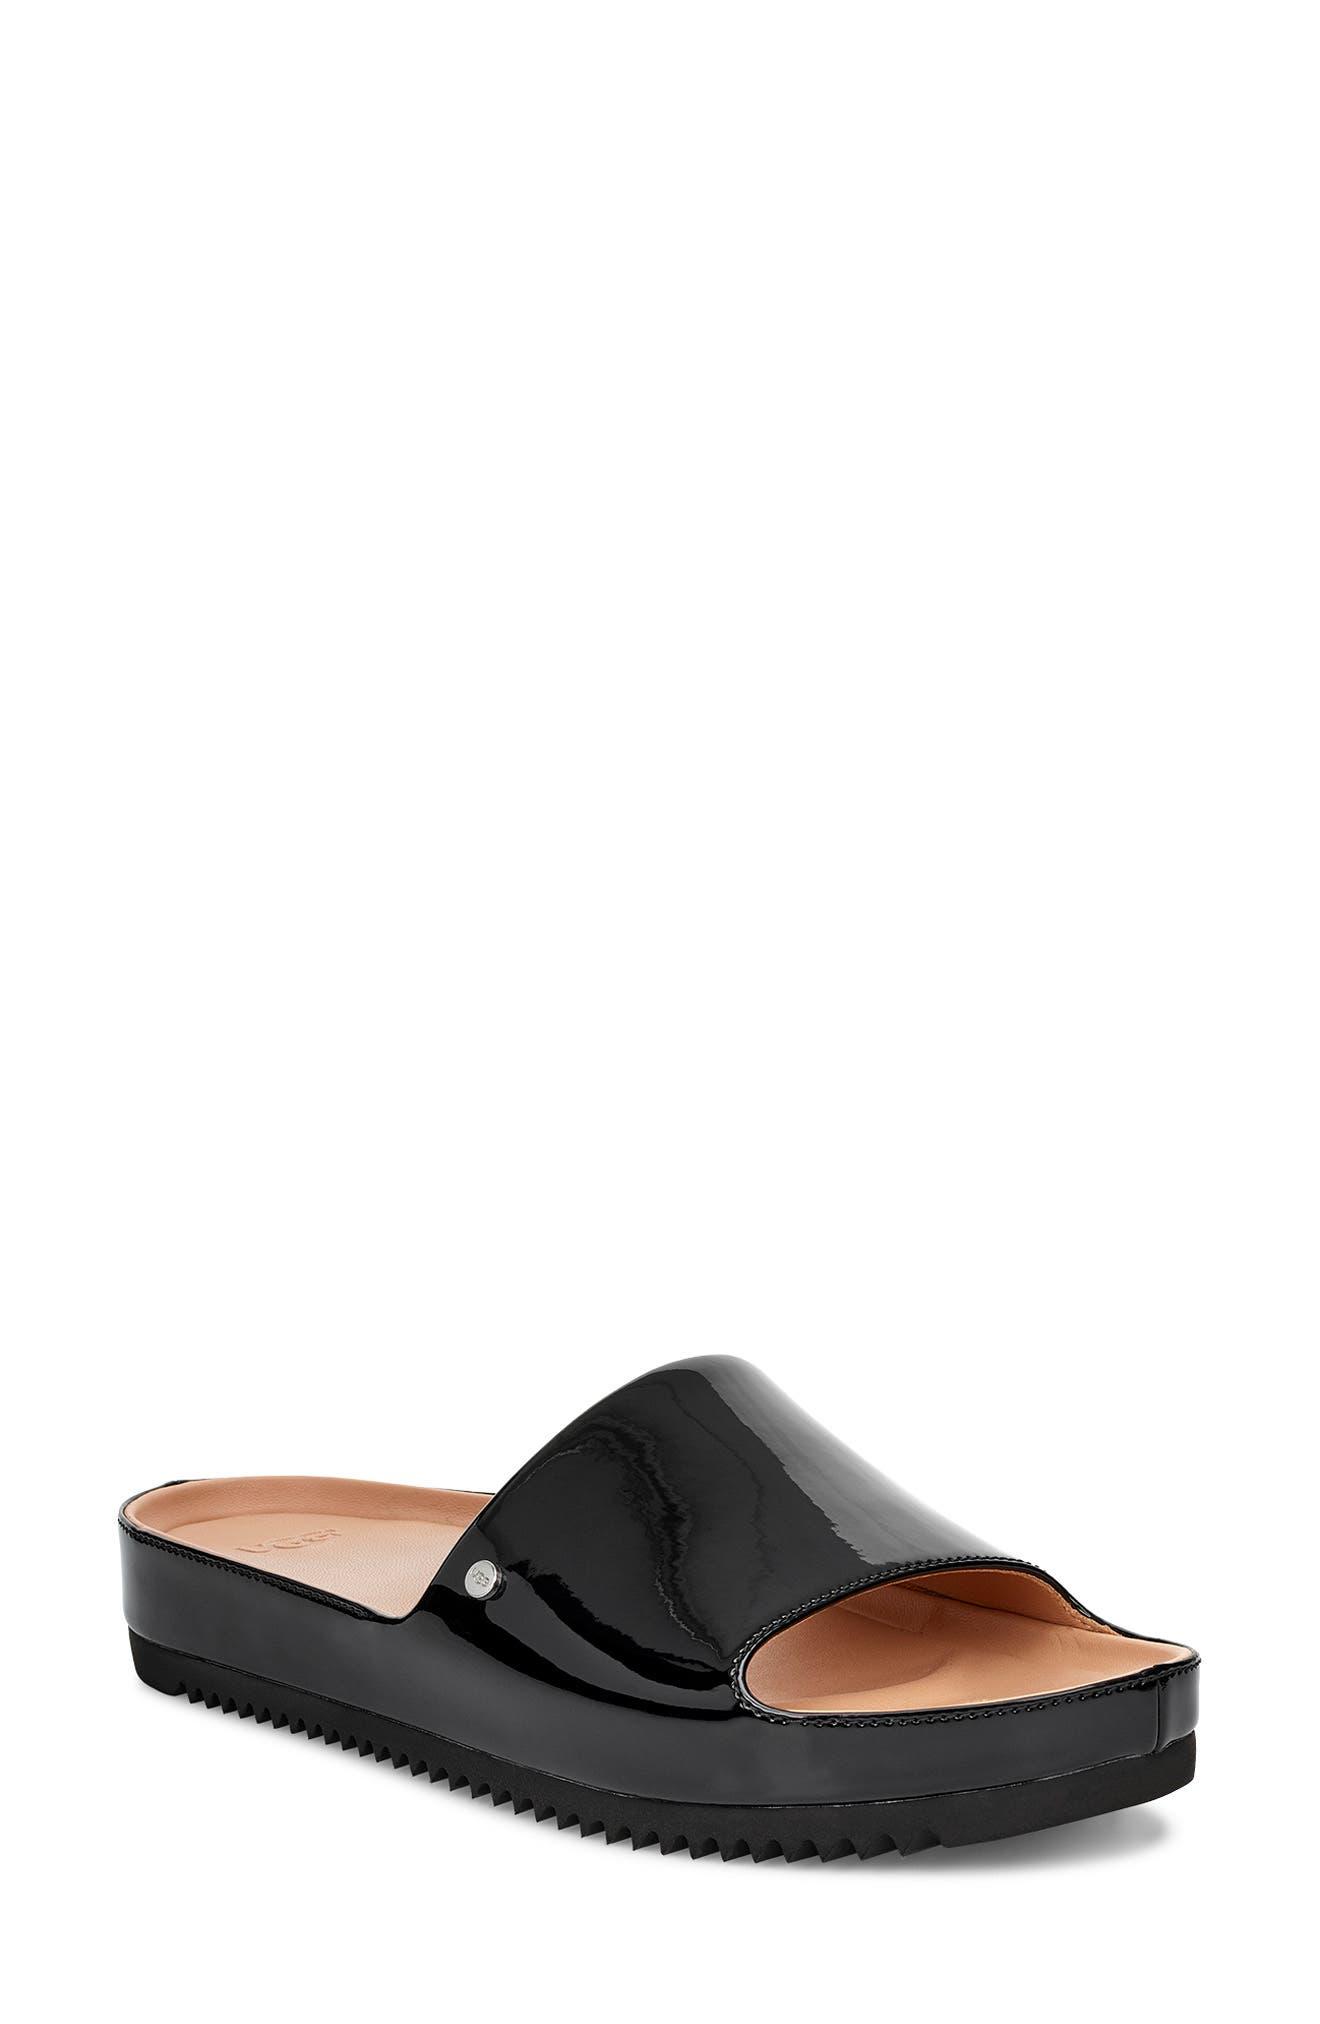 Jane Platform Slide Sandal,                             Main thumbnail 1, color,                             BLACK PATENT LEATHER